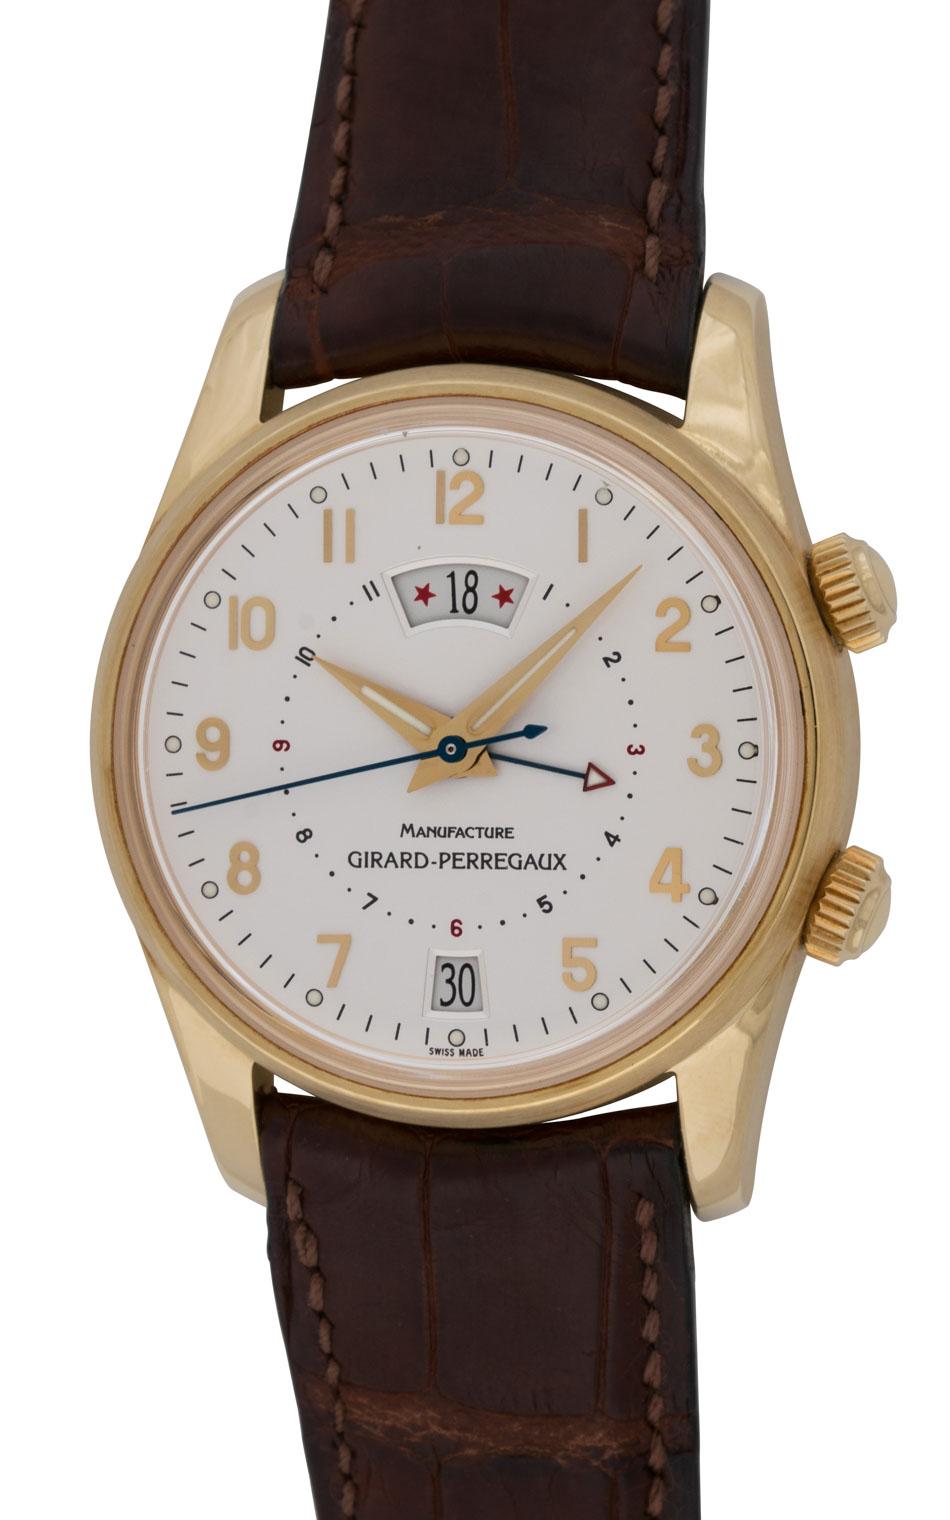 Girard-Perregaux - Traveler II GMT Alarm